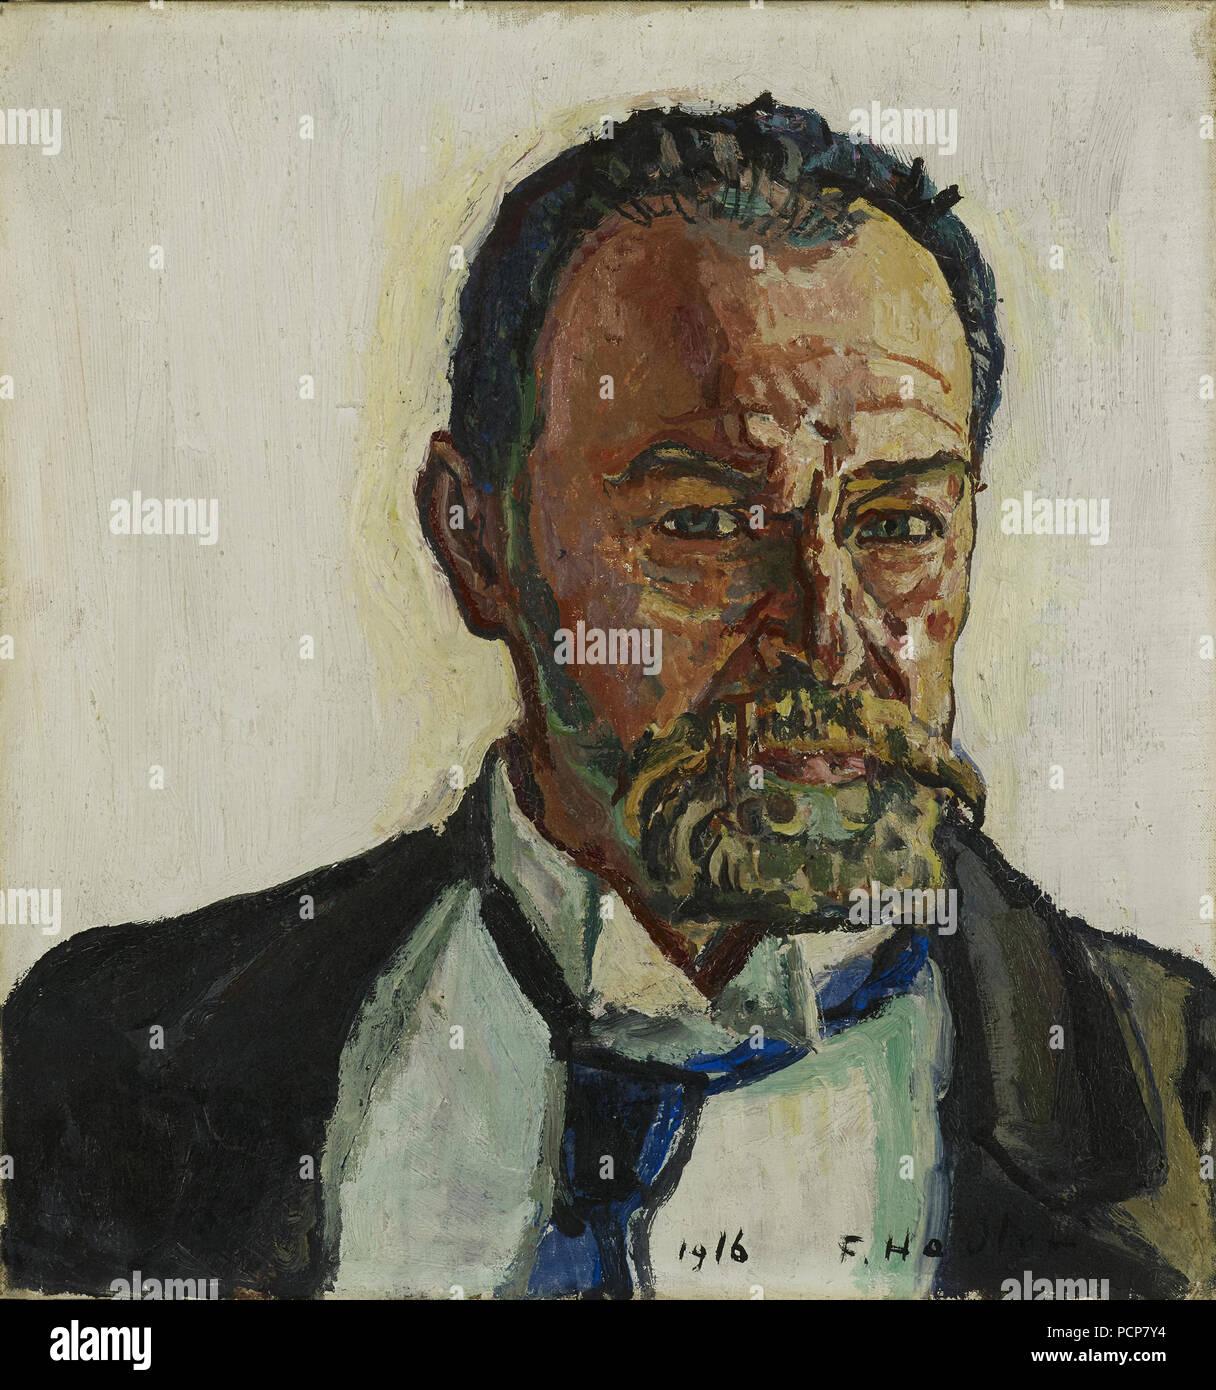 Self-Portrait, 1916. Foto de stock